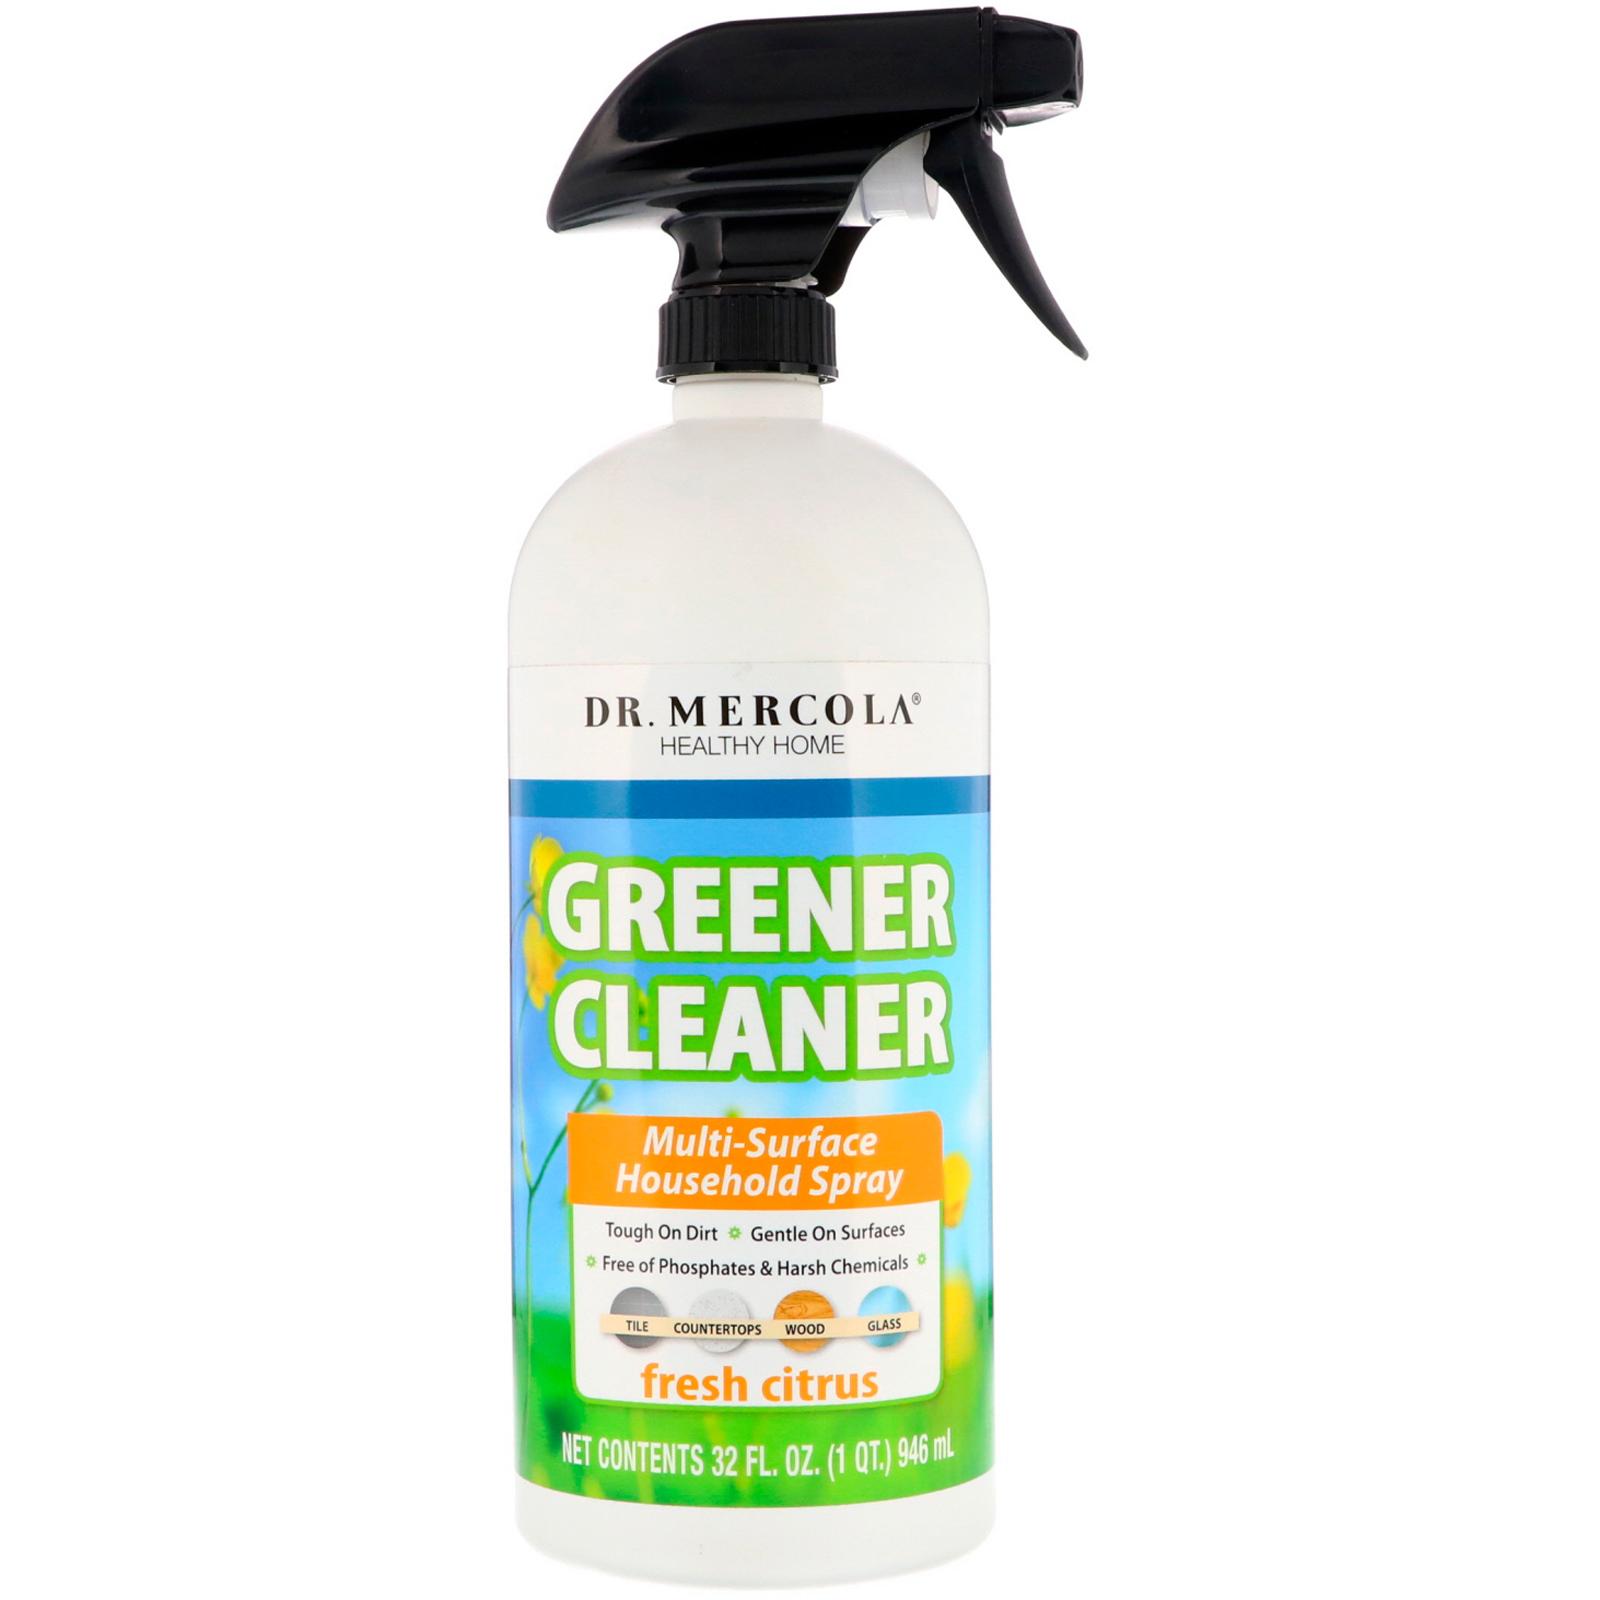 Enjoyable Dr Mercola Greener Cleaner Multi Surface Household Spray Download Free Architecture Designs Scobabritishbridgeorg